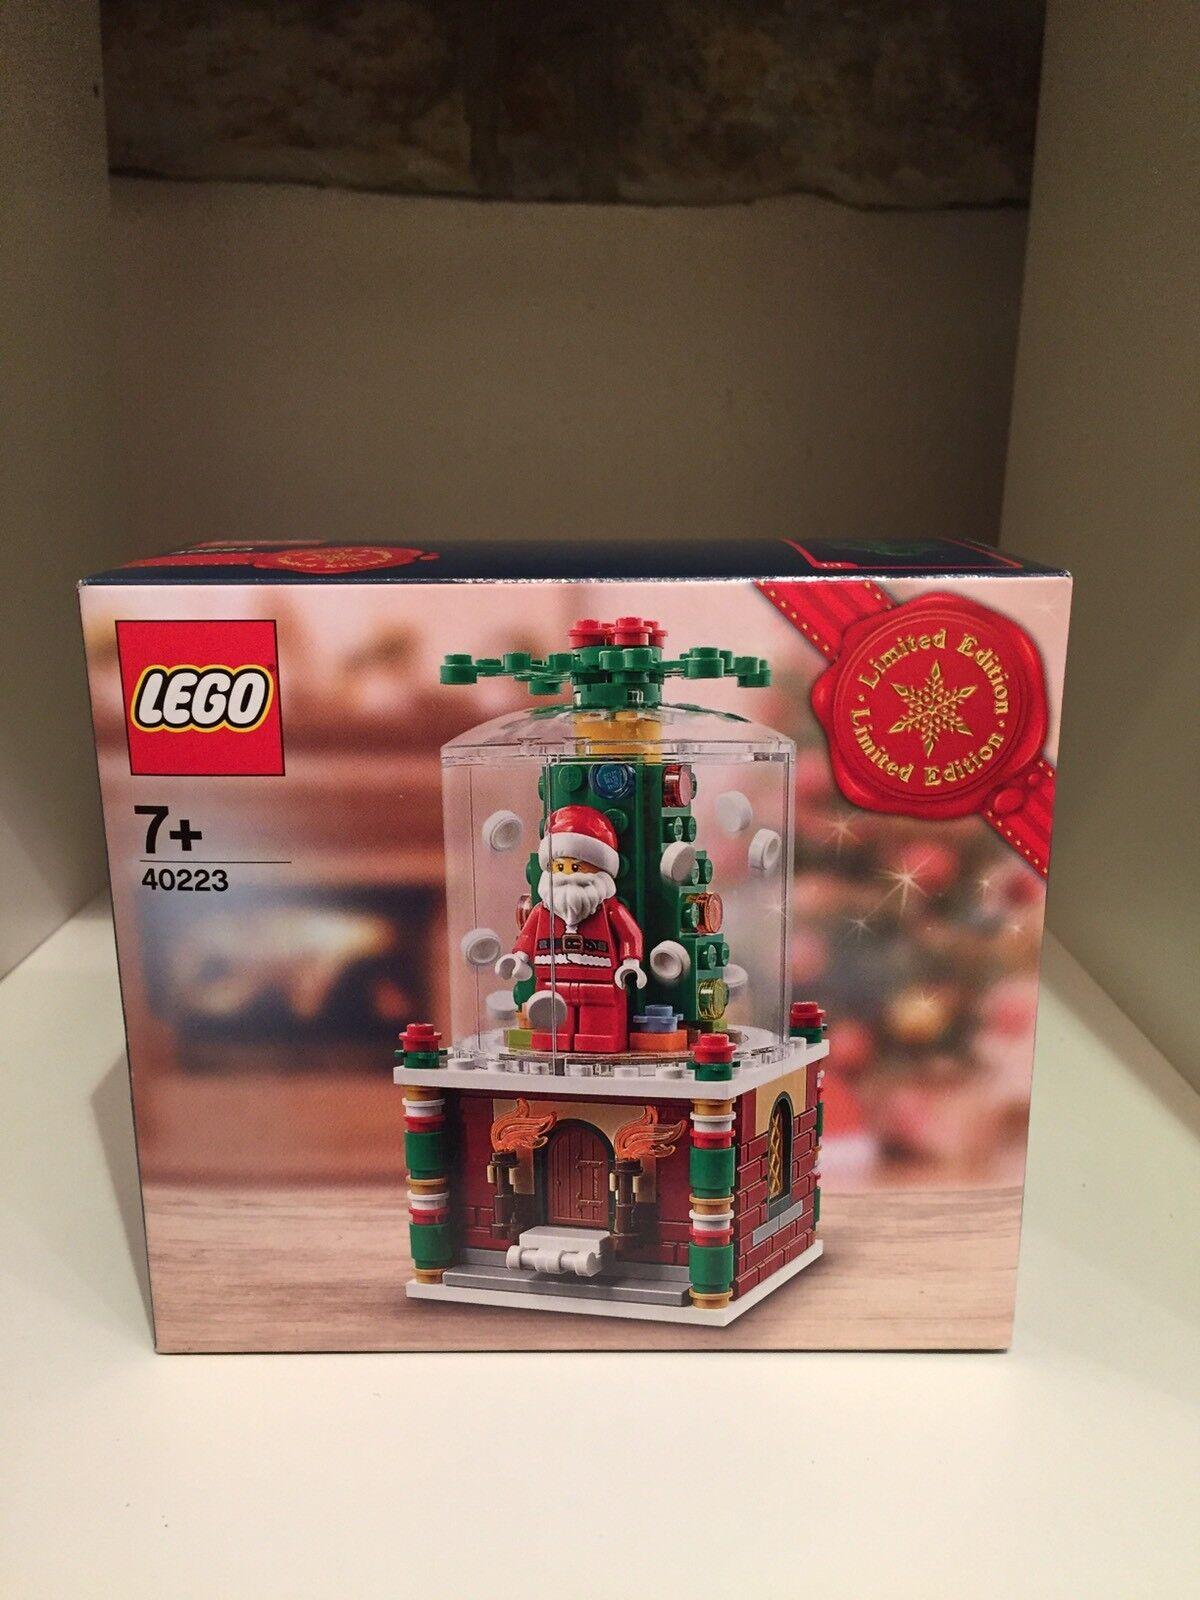 LEGO 40223 SNOWGLOBE EXCLUSIVE LIMITED EDITION CHRISTMAS 2016 BNIB SEASONAL NEW